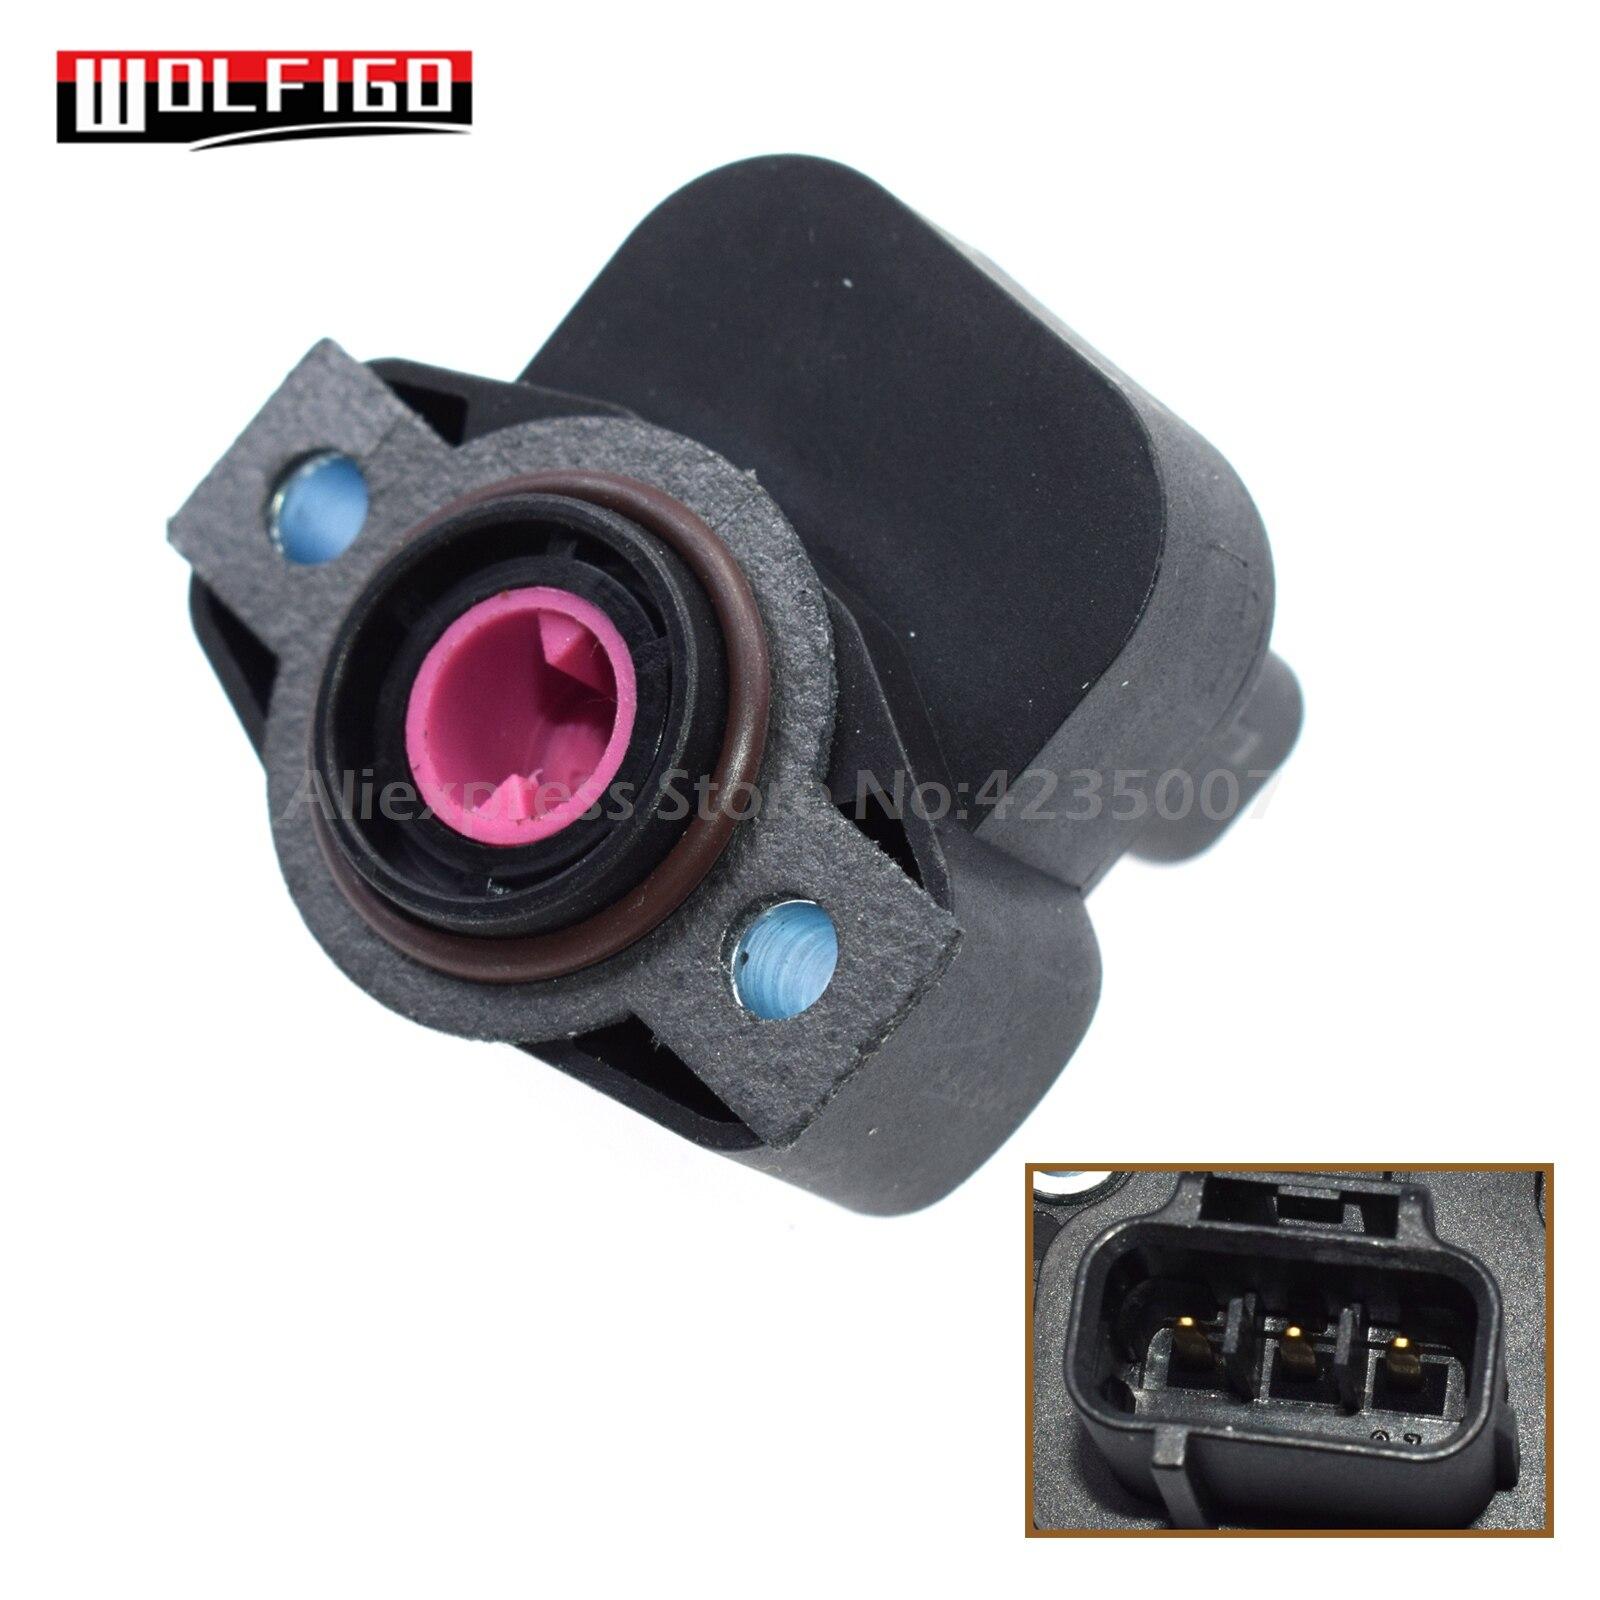 WOLFIGO nuevo Sensor de situación de acelerador TPS para Chrysler Dodge Plymouth 4874371,4606083 4874371AB 4874371AC 4874371AF 4686360